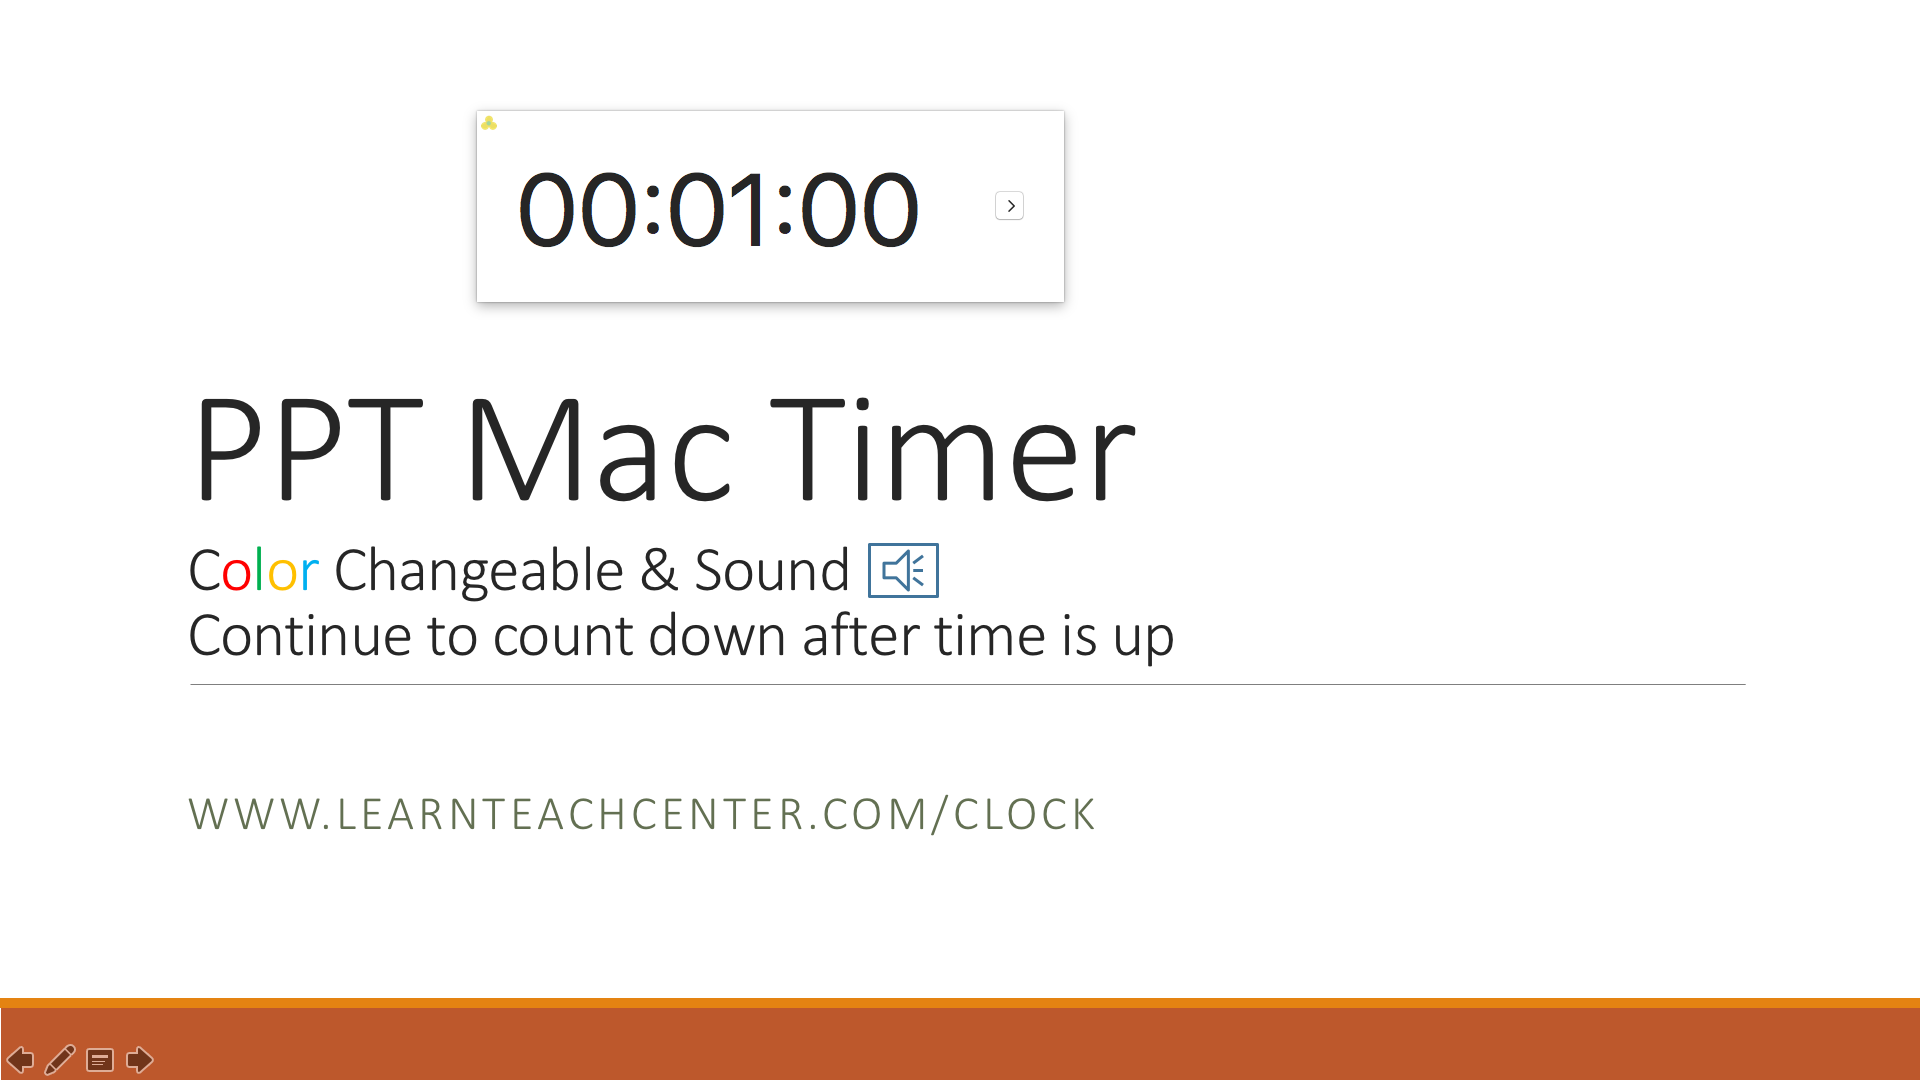 PPT Mac Timer CSP